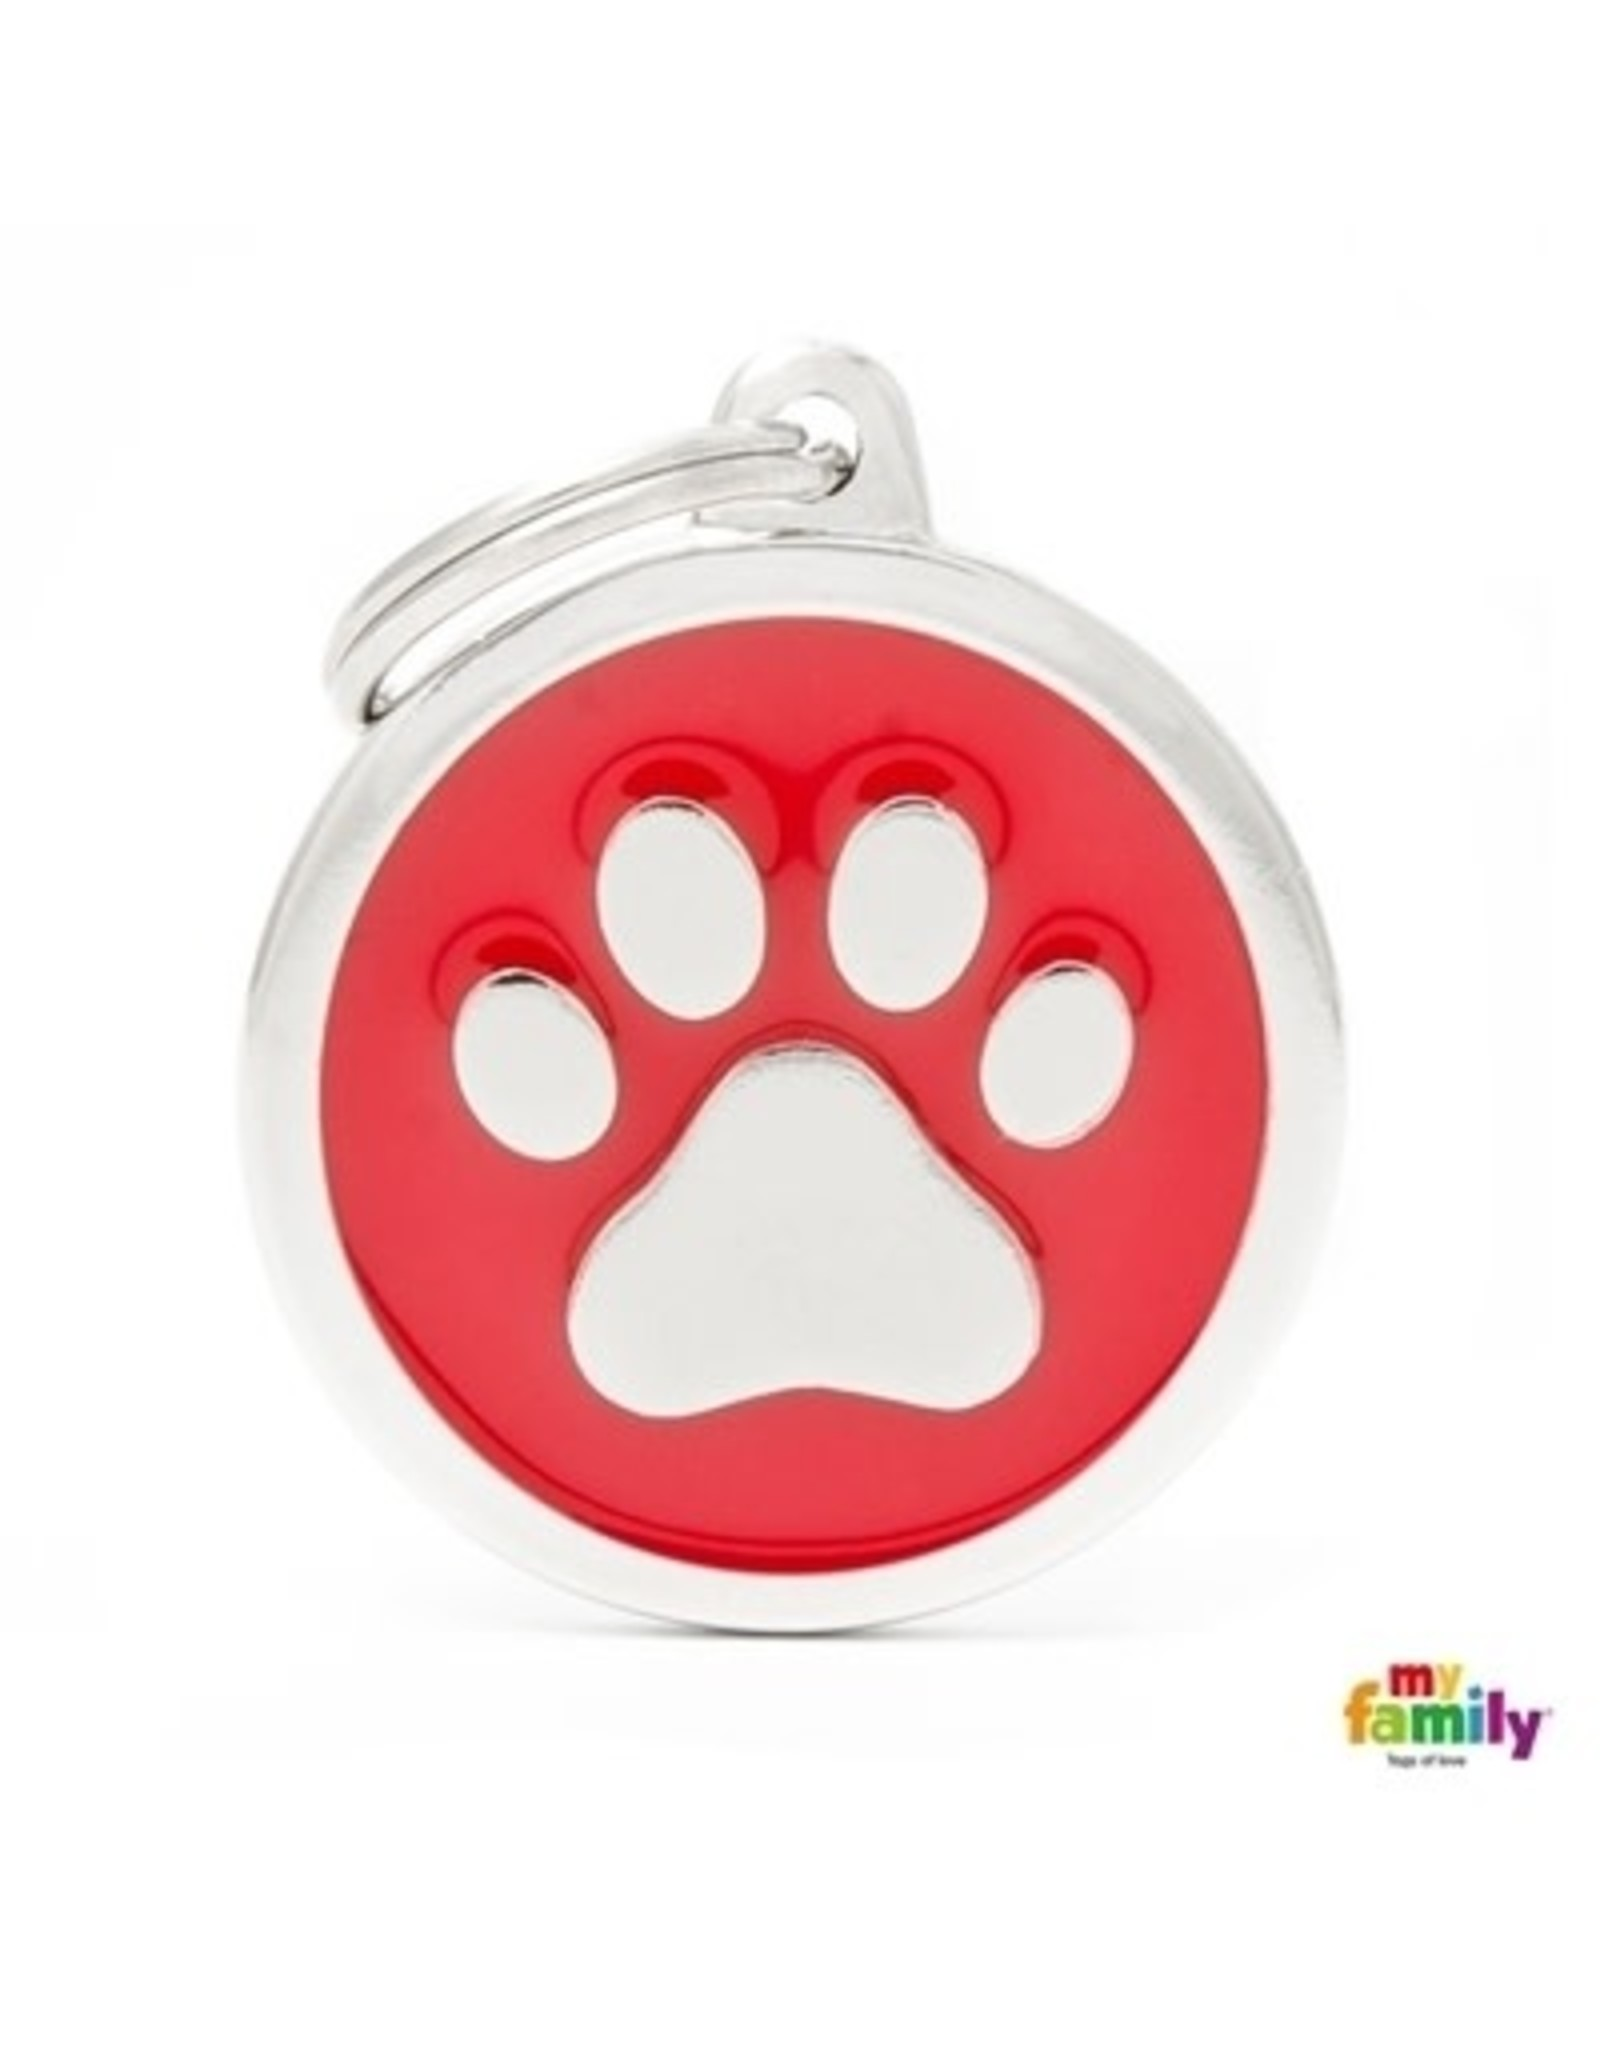 MyFamily Tag - Red Big Circle Paw